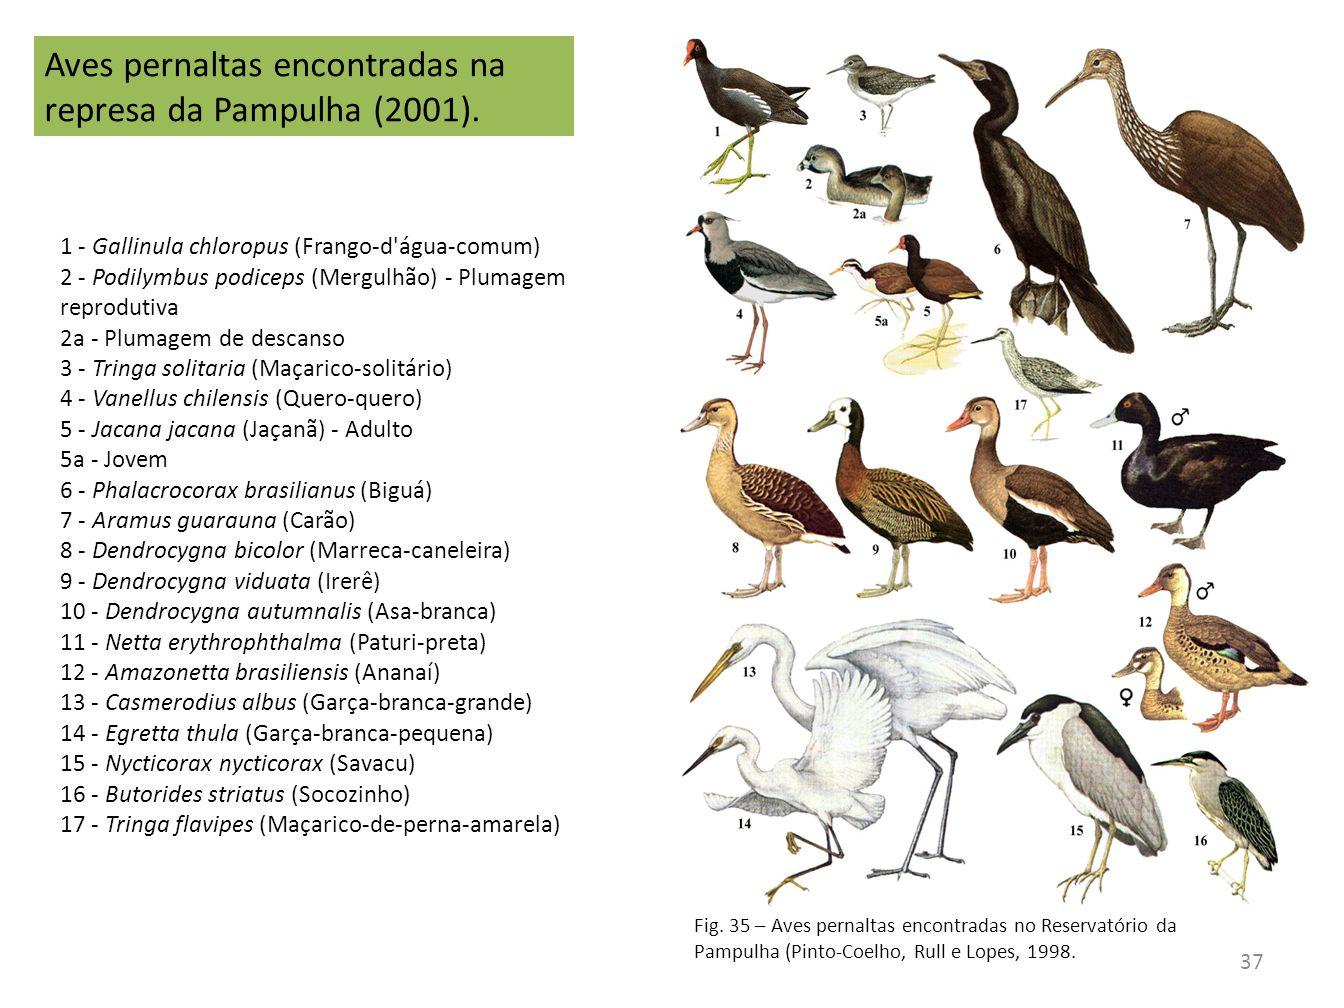 Aves pernaltas encontradas na represa da Pampulha (2001).